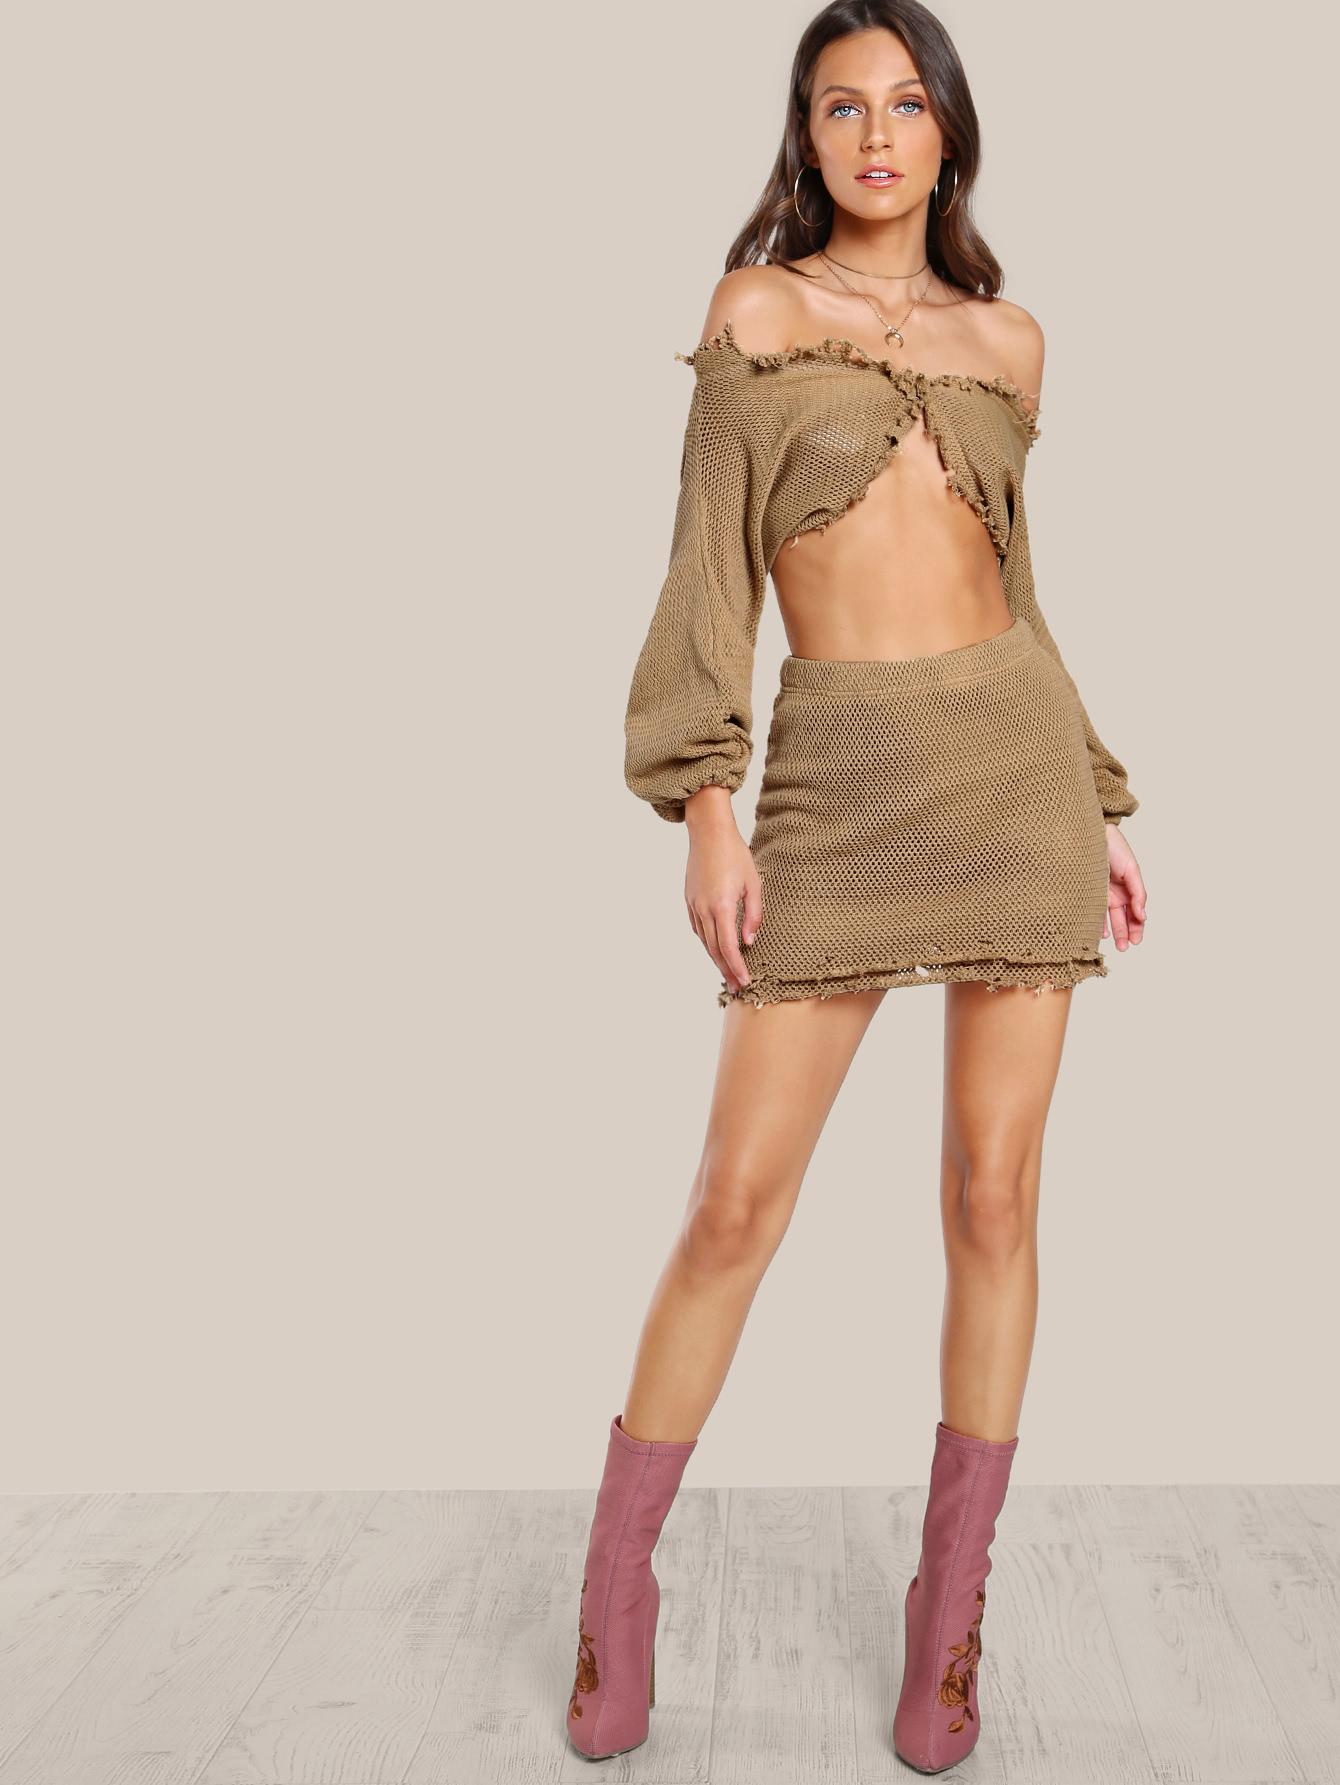 Raw Hem Knitted Skirt MOCHA -SheIn(Sheinside)